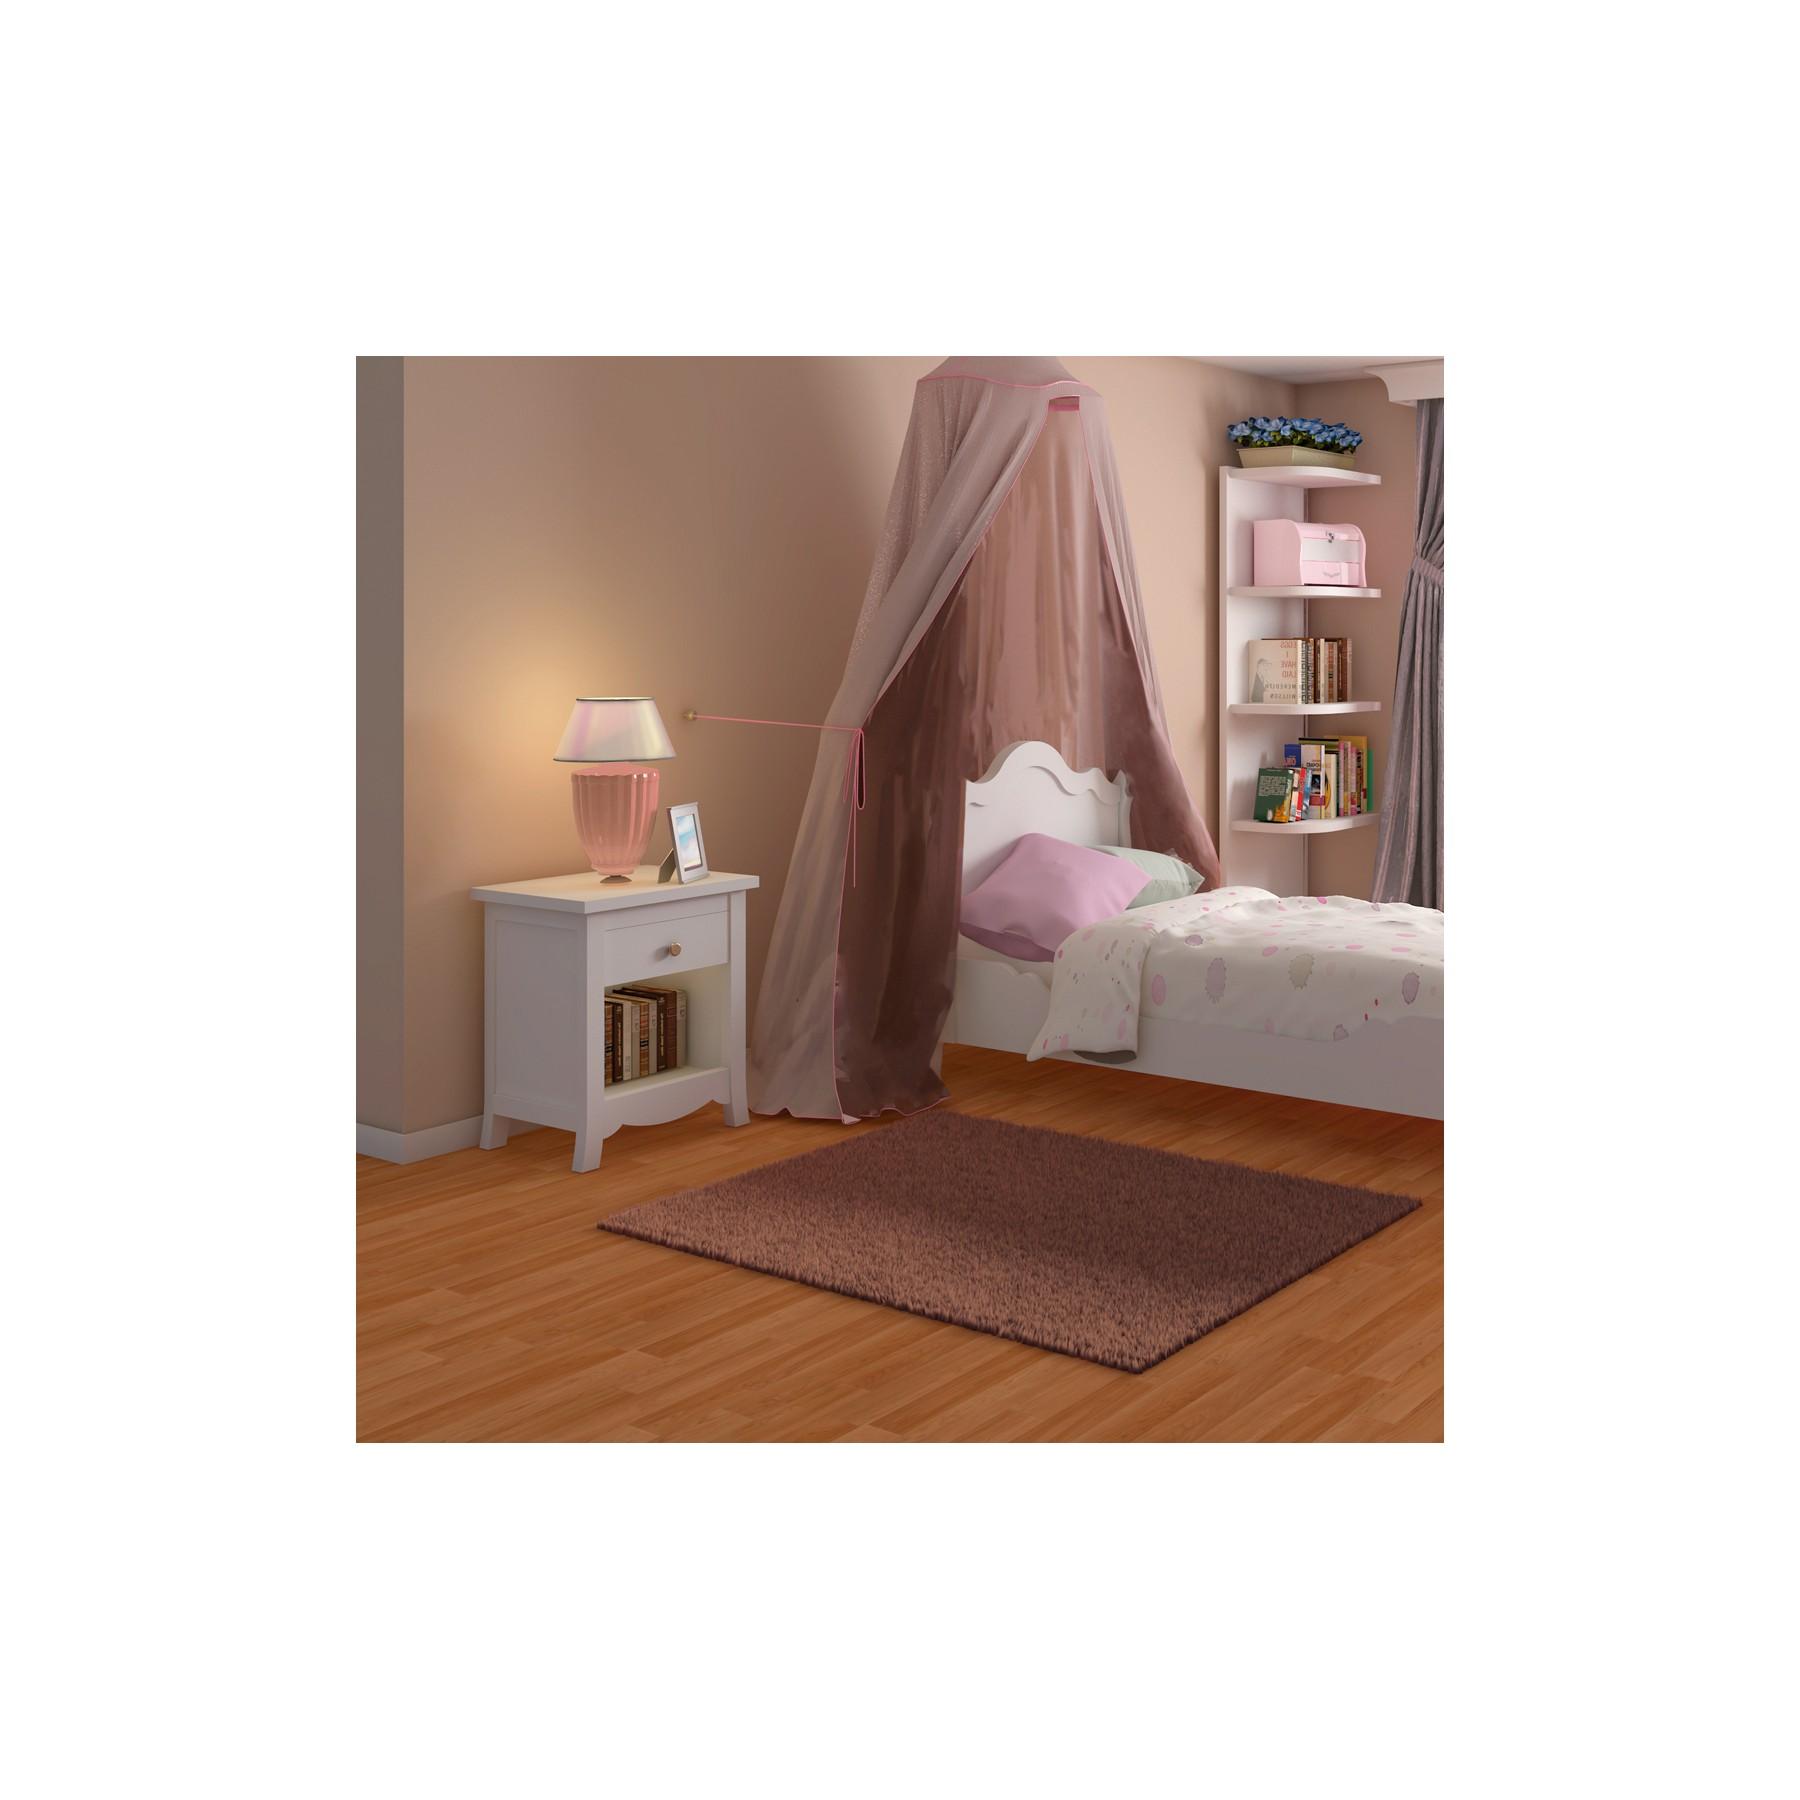 Conjunto de muebles para dormitorio juvenil de dise o toscana for Diseno dormitorio juvenil